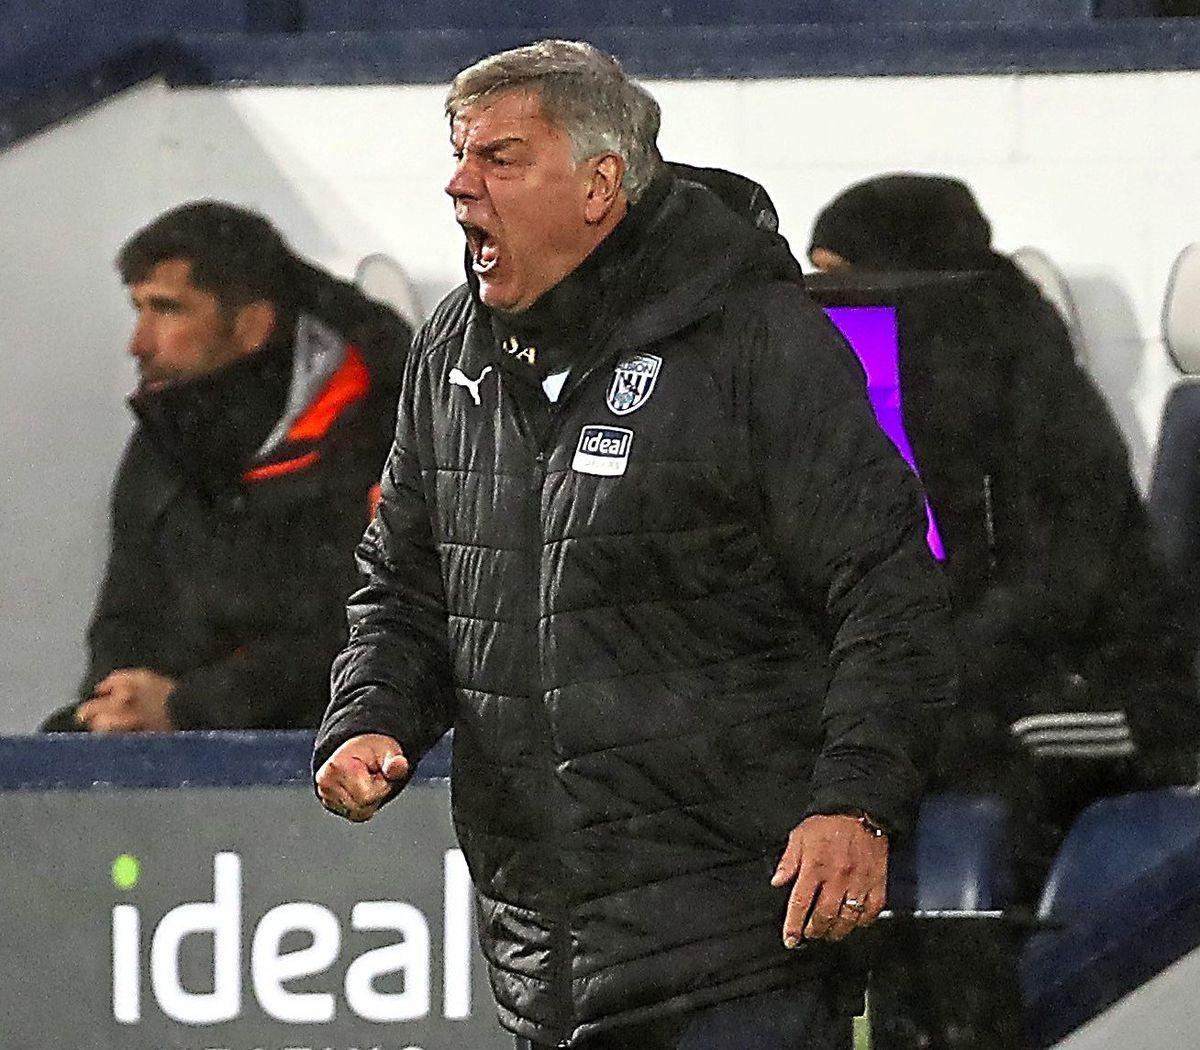 Sam Allardyce head coach / manager of West Bromwich Albion.